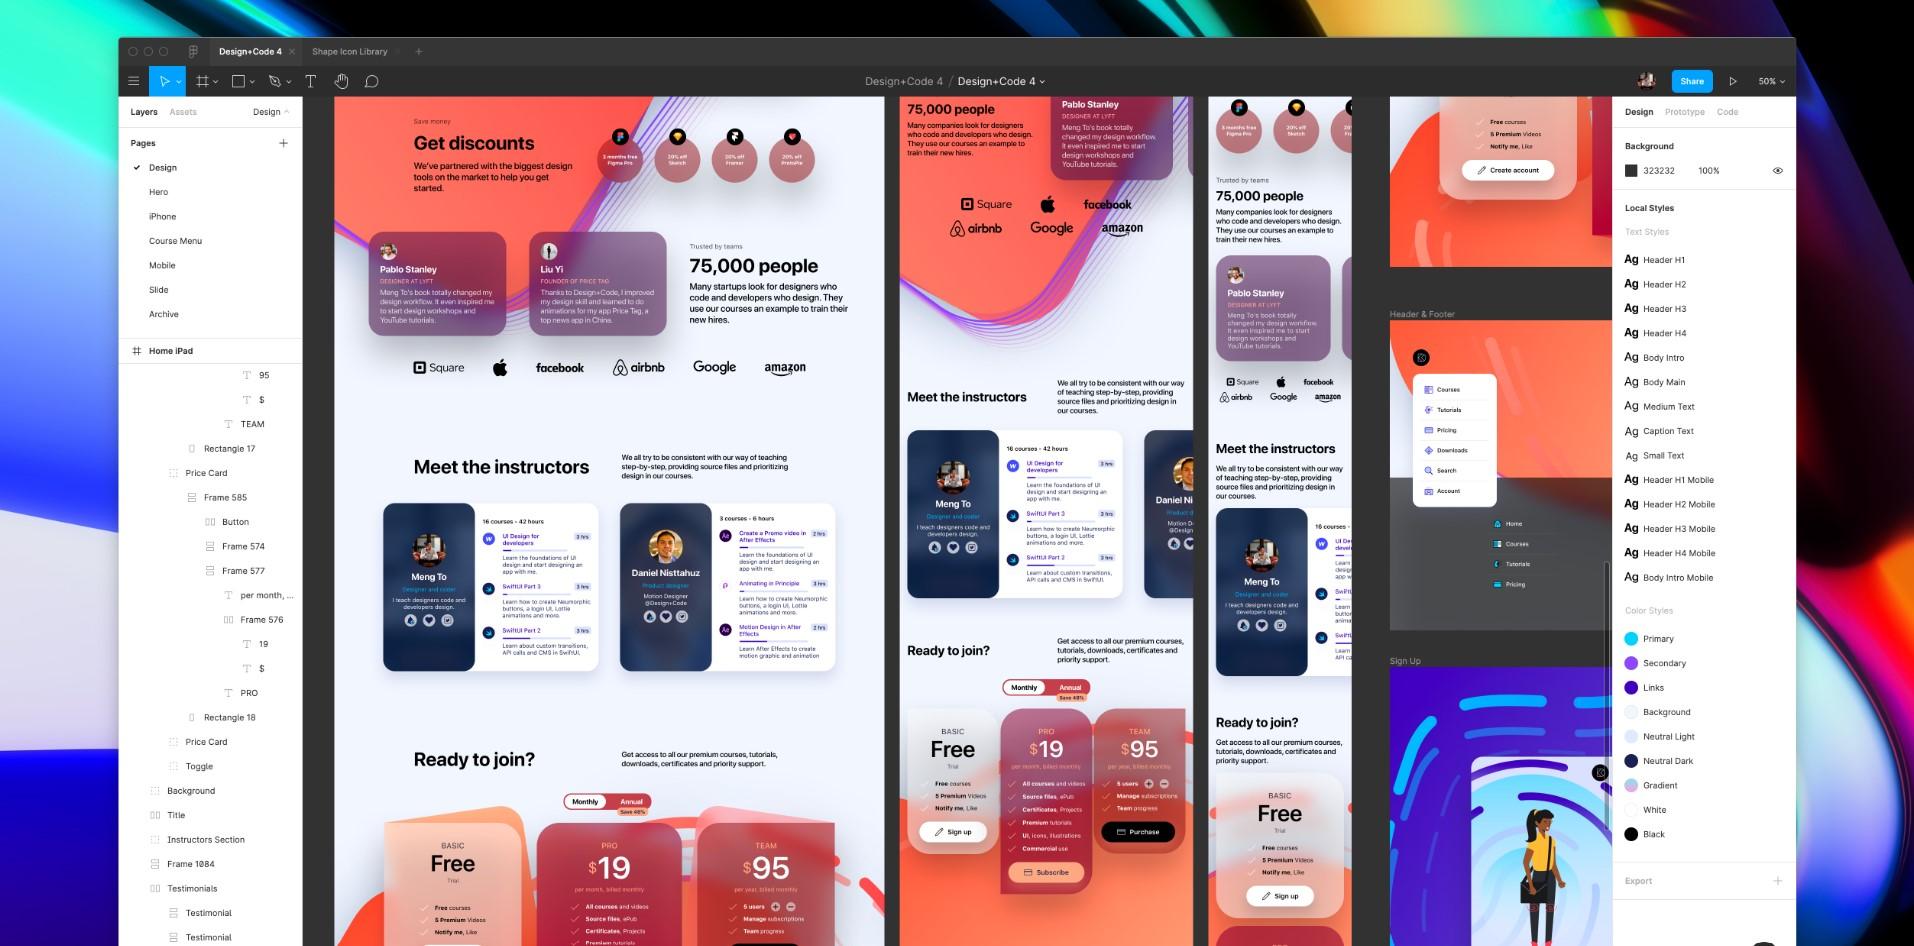 UI Design for Developers course